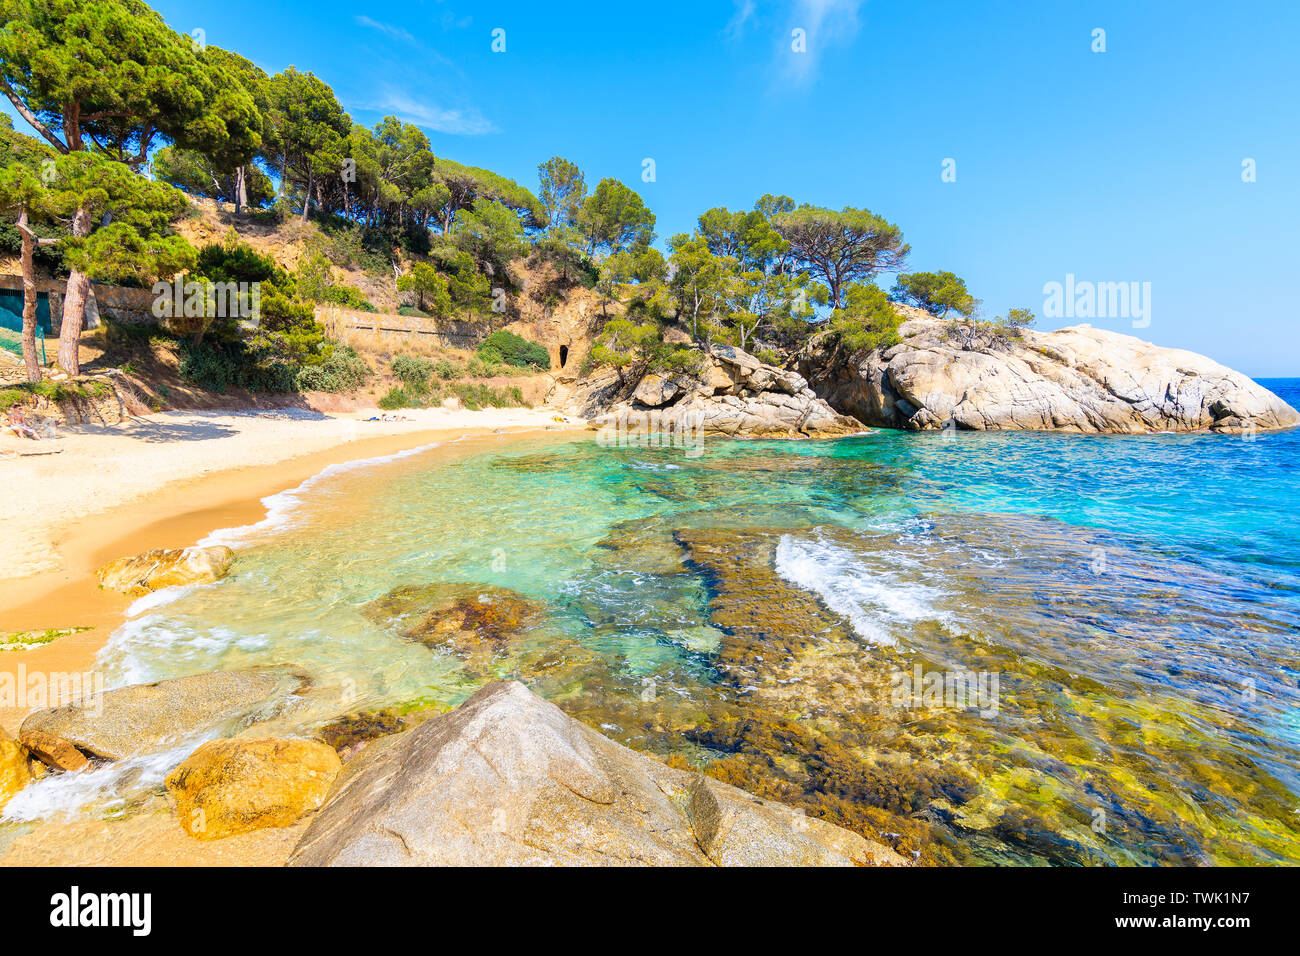 Idyllic sandy Cala Pi beach near Cap Roig, Costa Brava, Spain Stock Photo